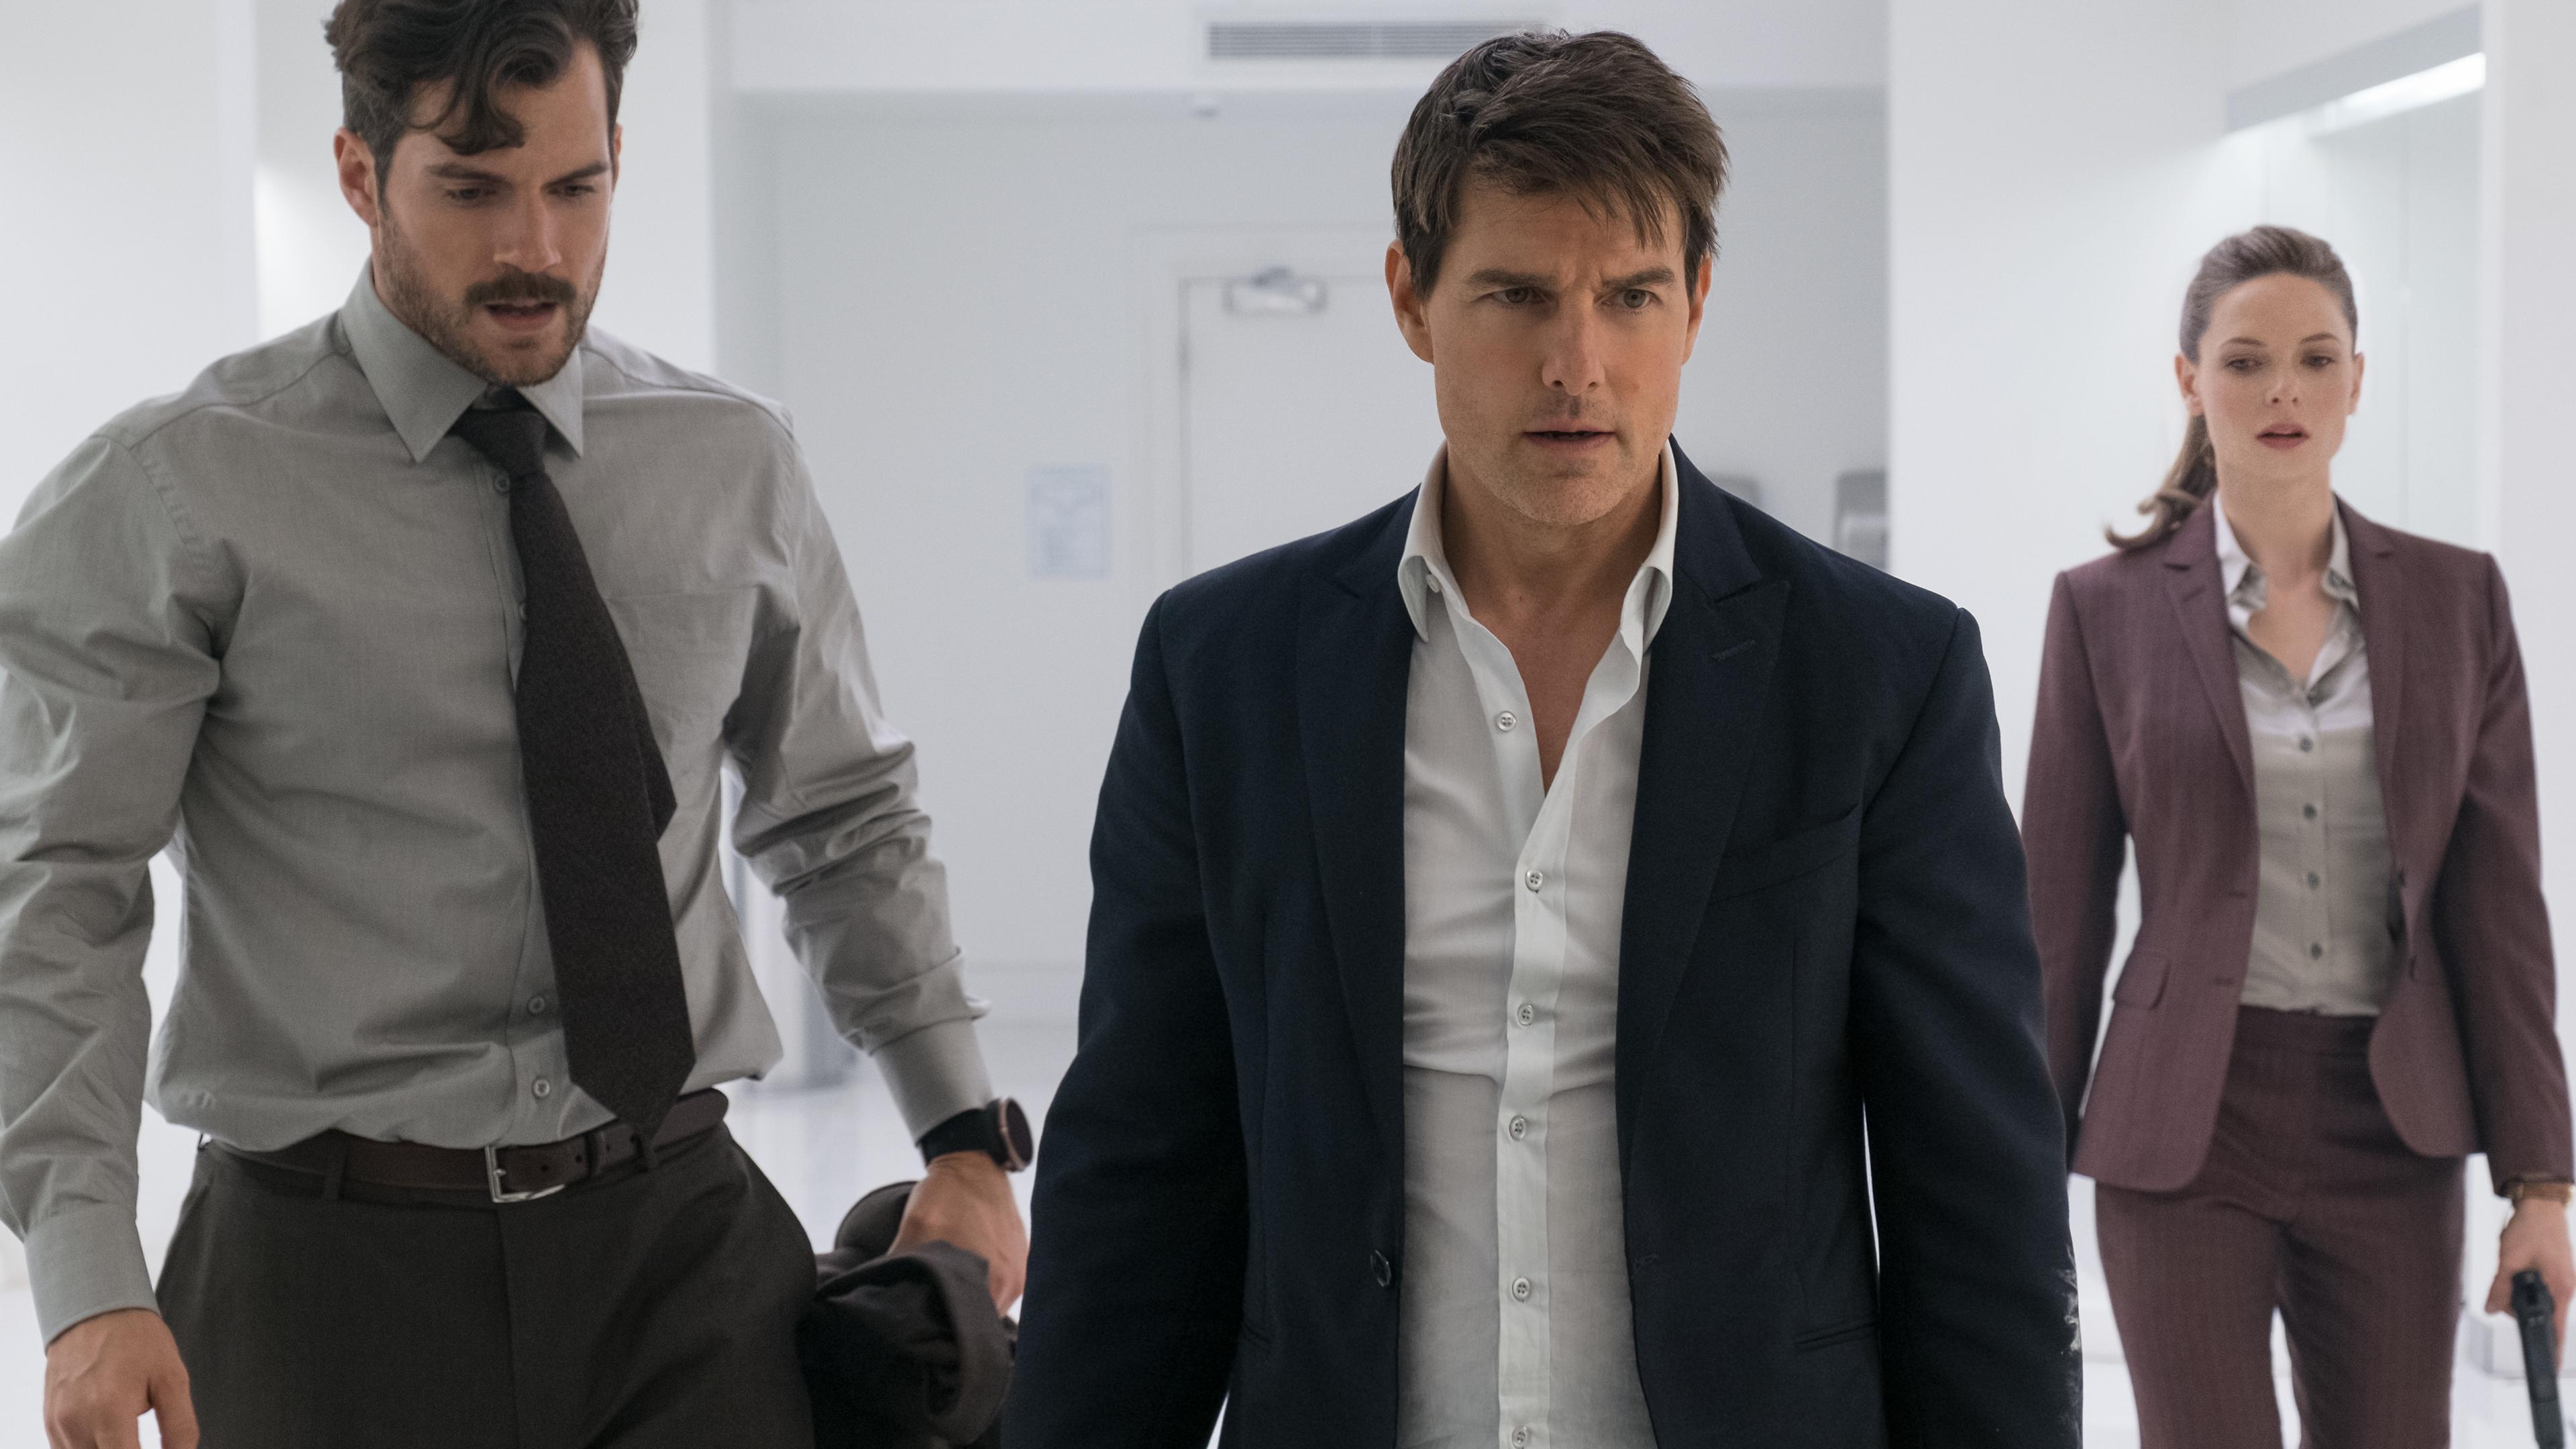 Wallpaper 4k Mission Impossible Fallout Tom Cruise Rebecca